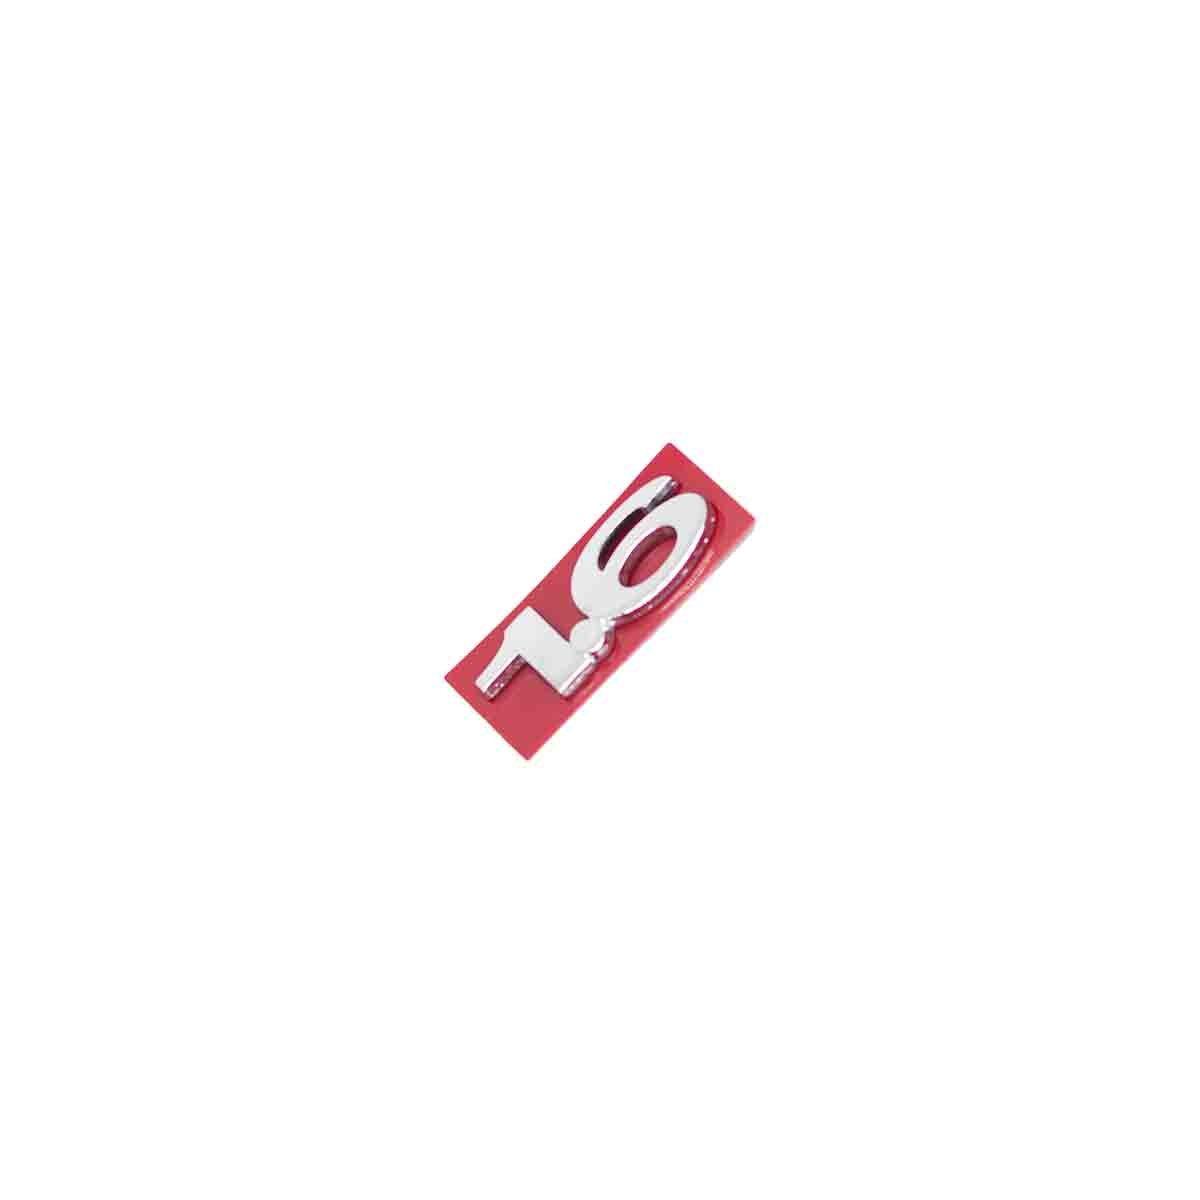 Emblema 1.6 Fiesta 2002/